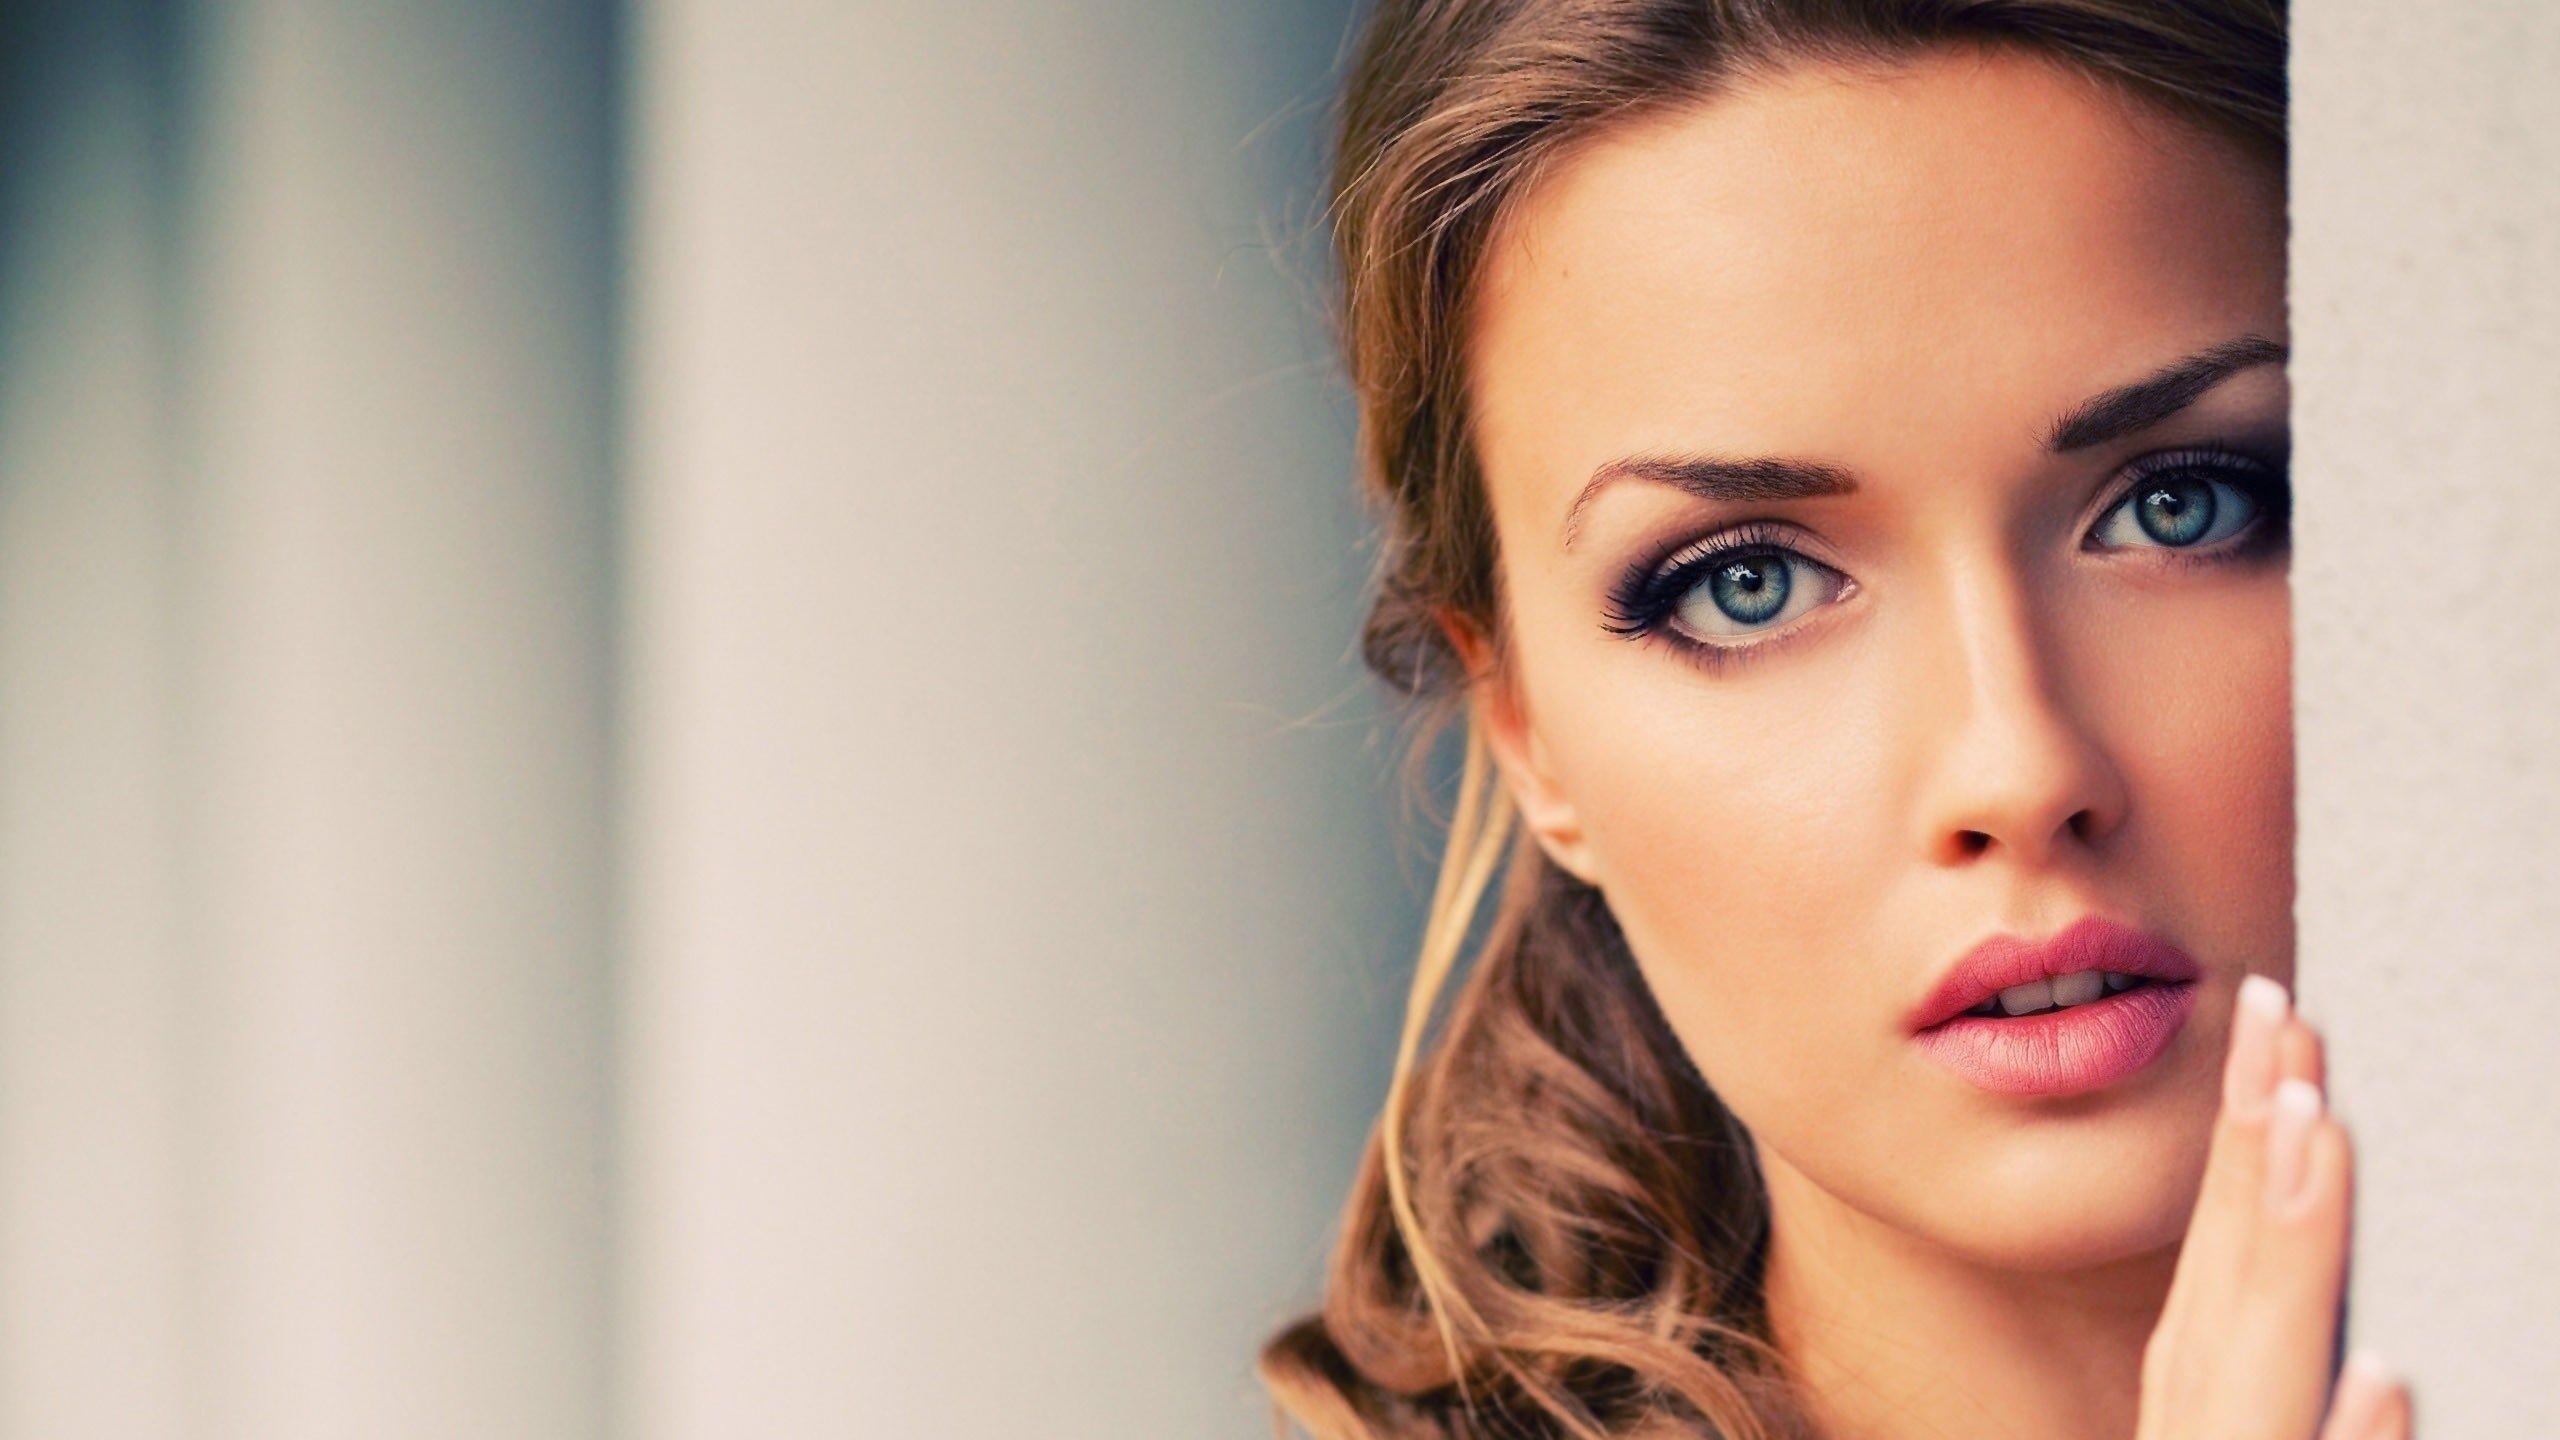 Compte à rebours  - Page 9 Girl-pretty-face-blue-eyes_2560x1440